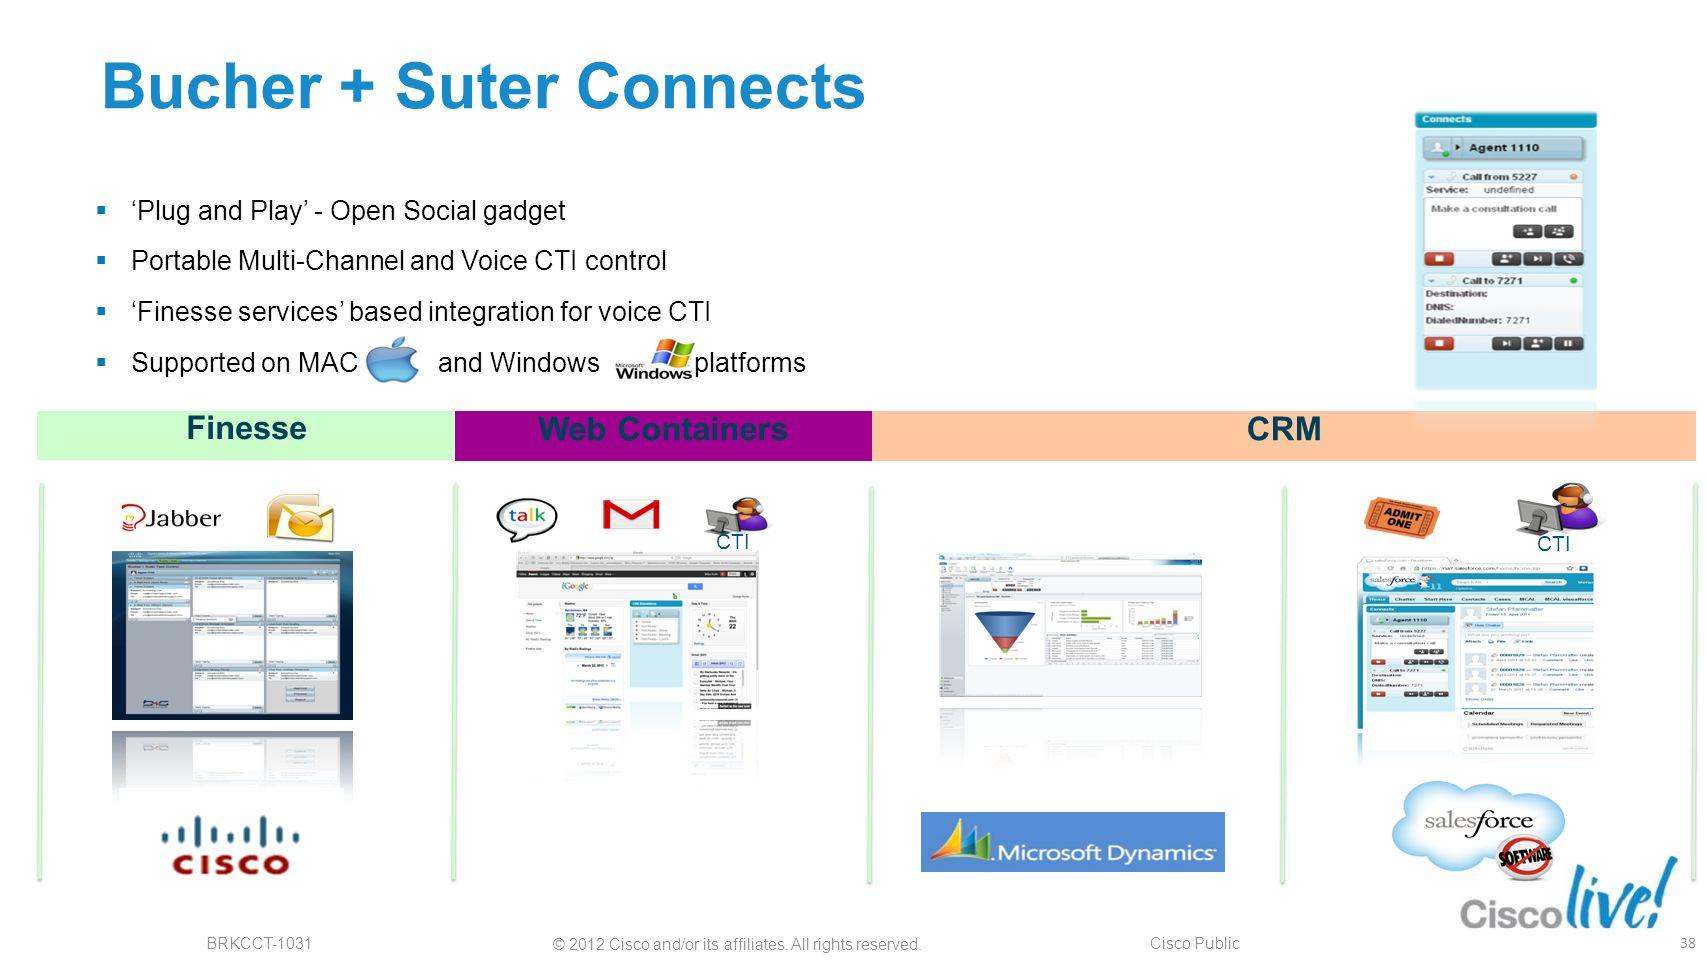 Bucher + Suter Connects